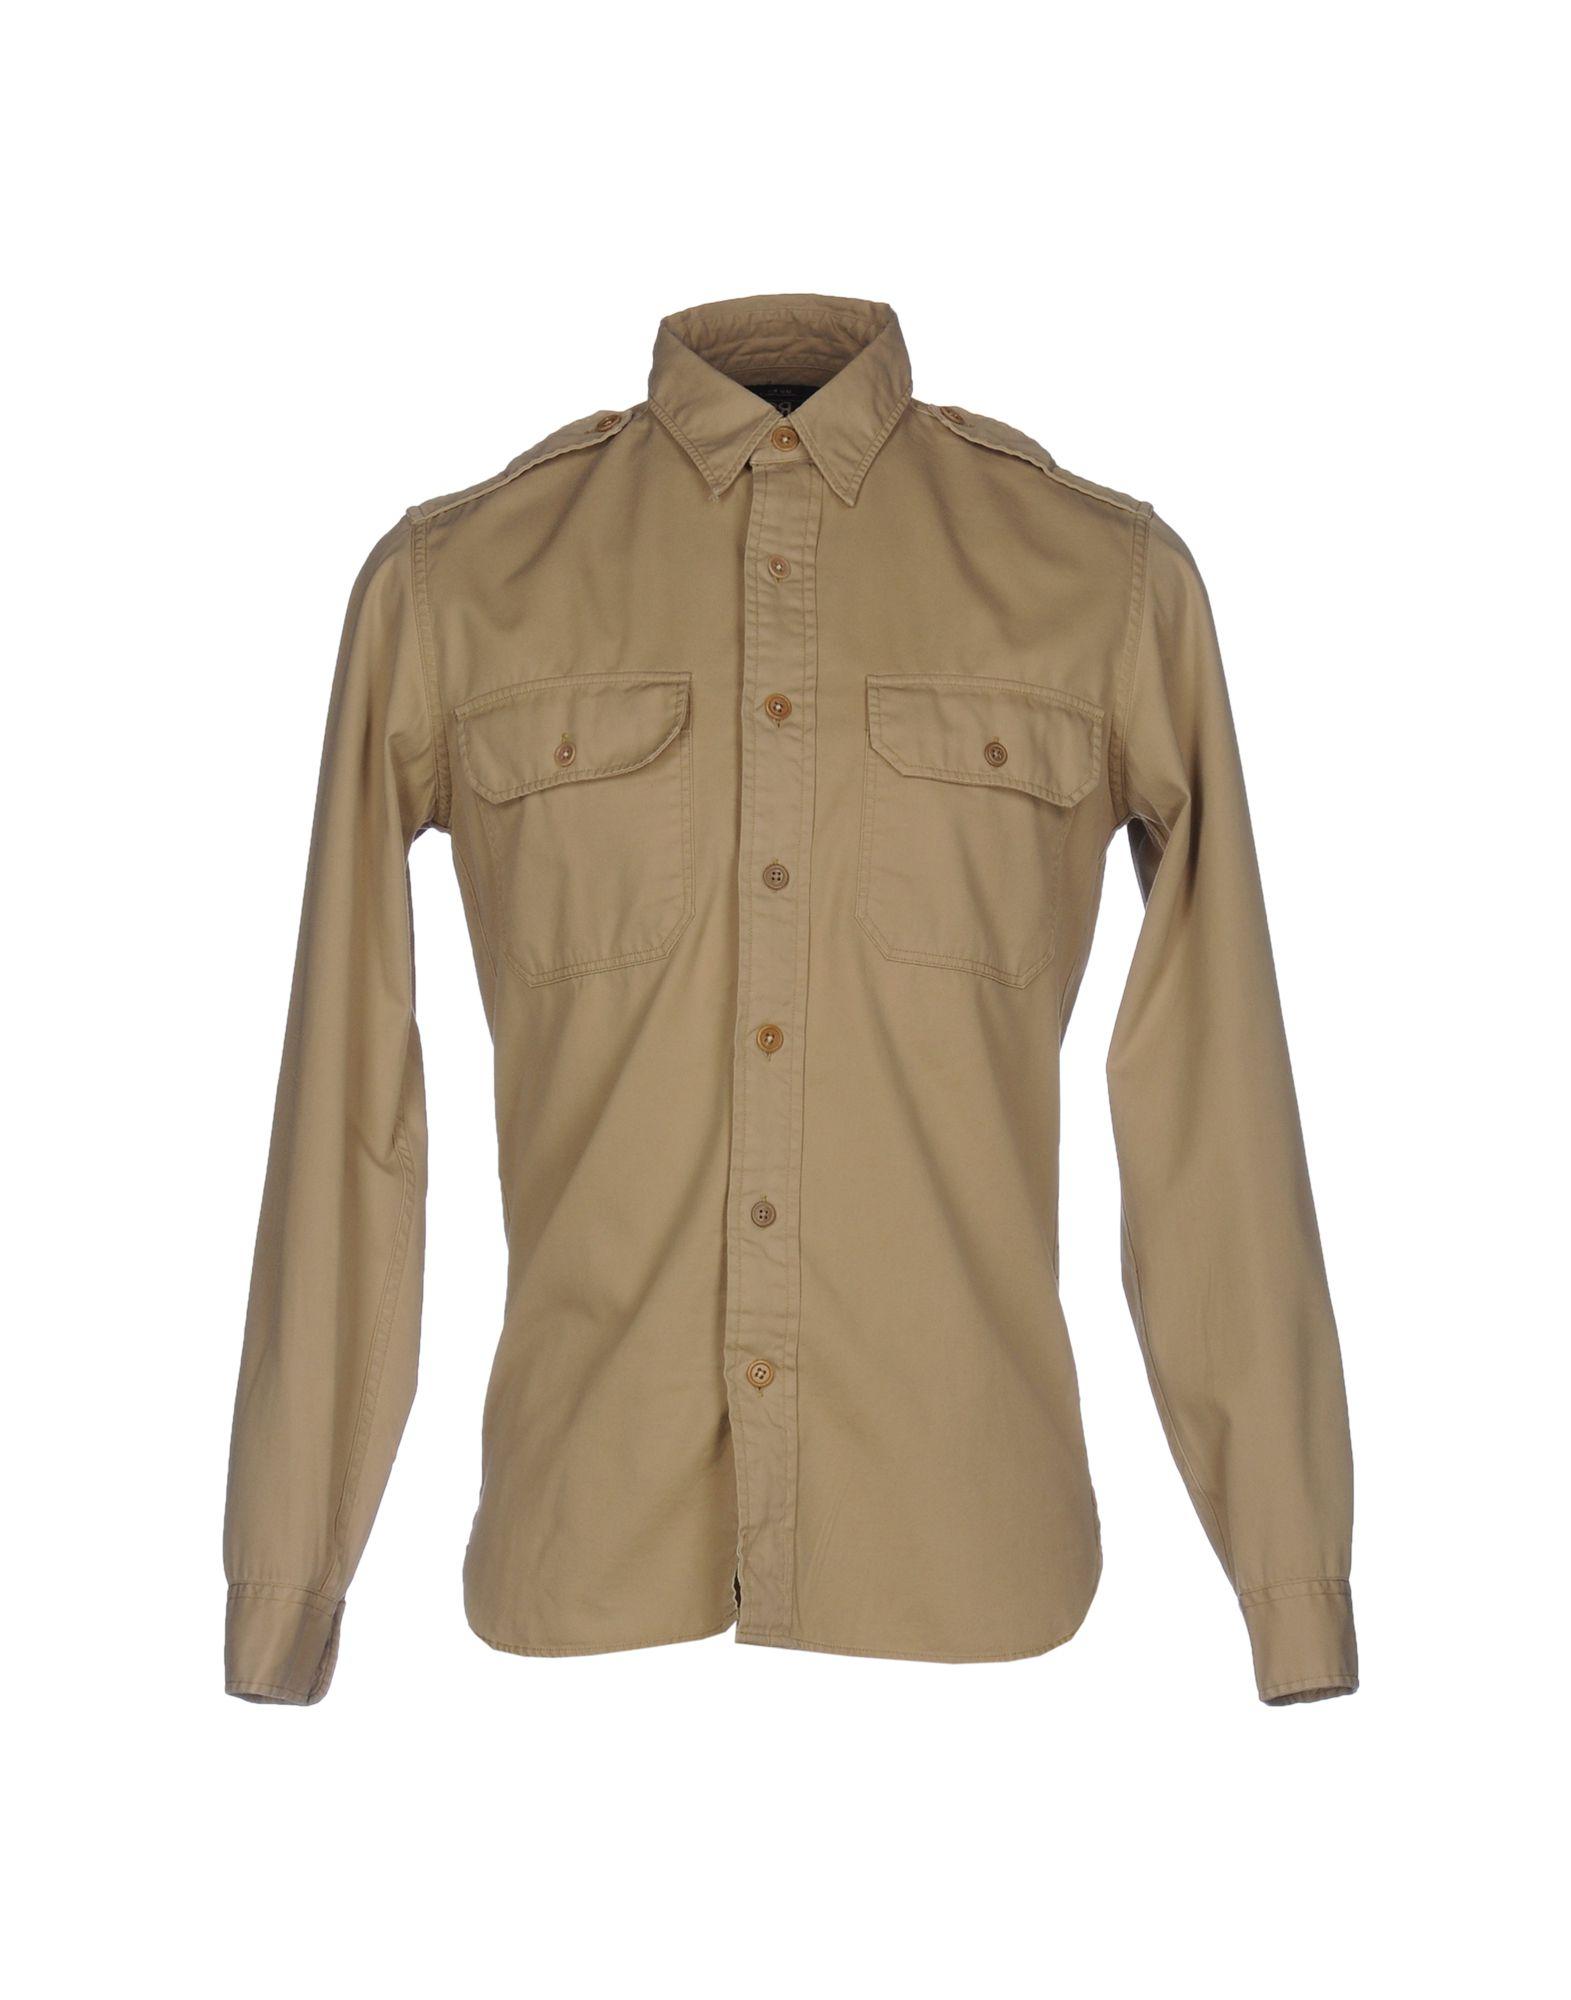 DOUBLE RL & CO. Shirts